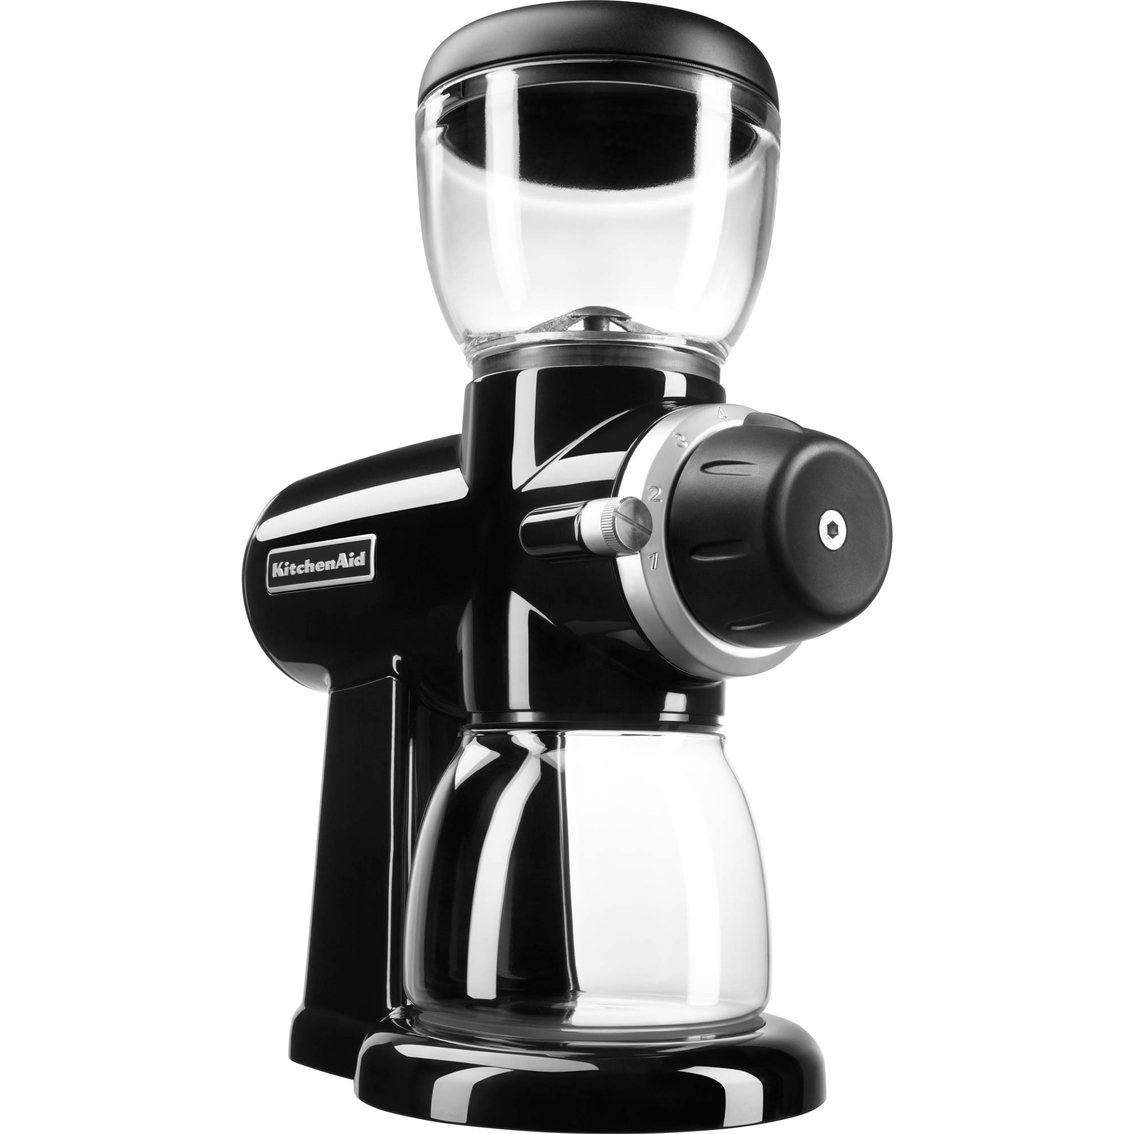 Kitchenaid Coffee Grinder ~ Kitchenaid kcg ob burr grinder coffee grinders home